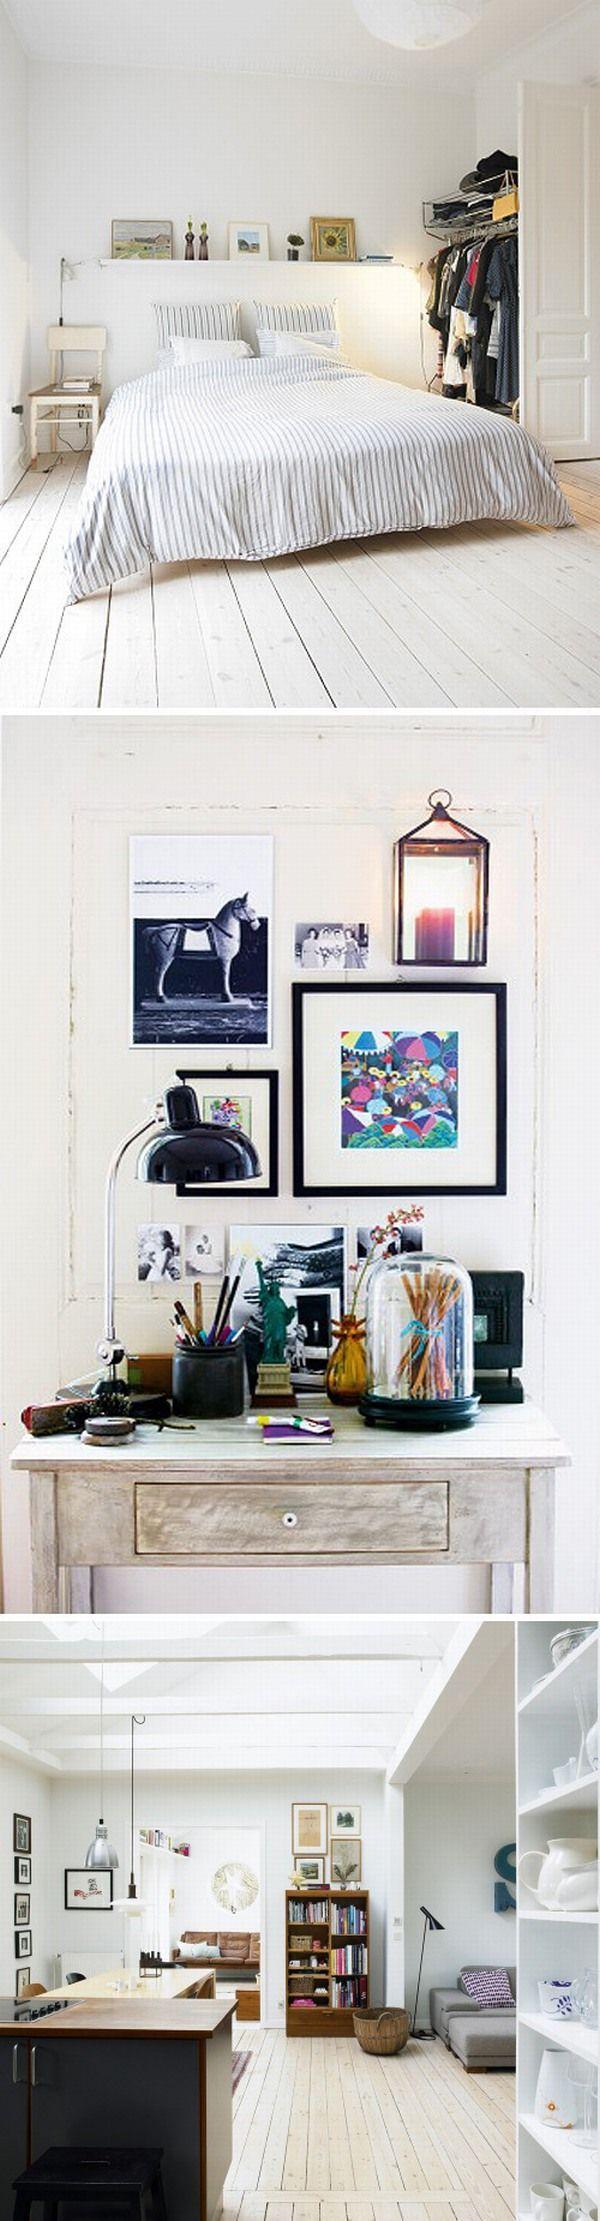 beautiful interior2 Warm and Stylish Scandinavian Interior Designs